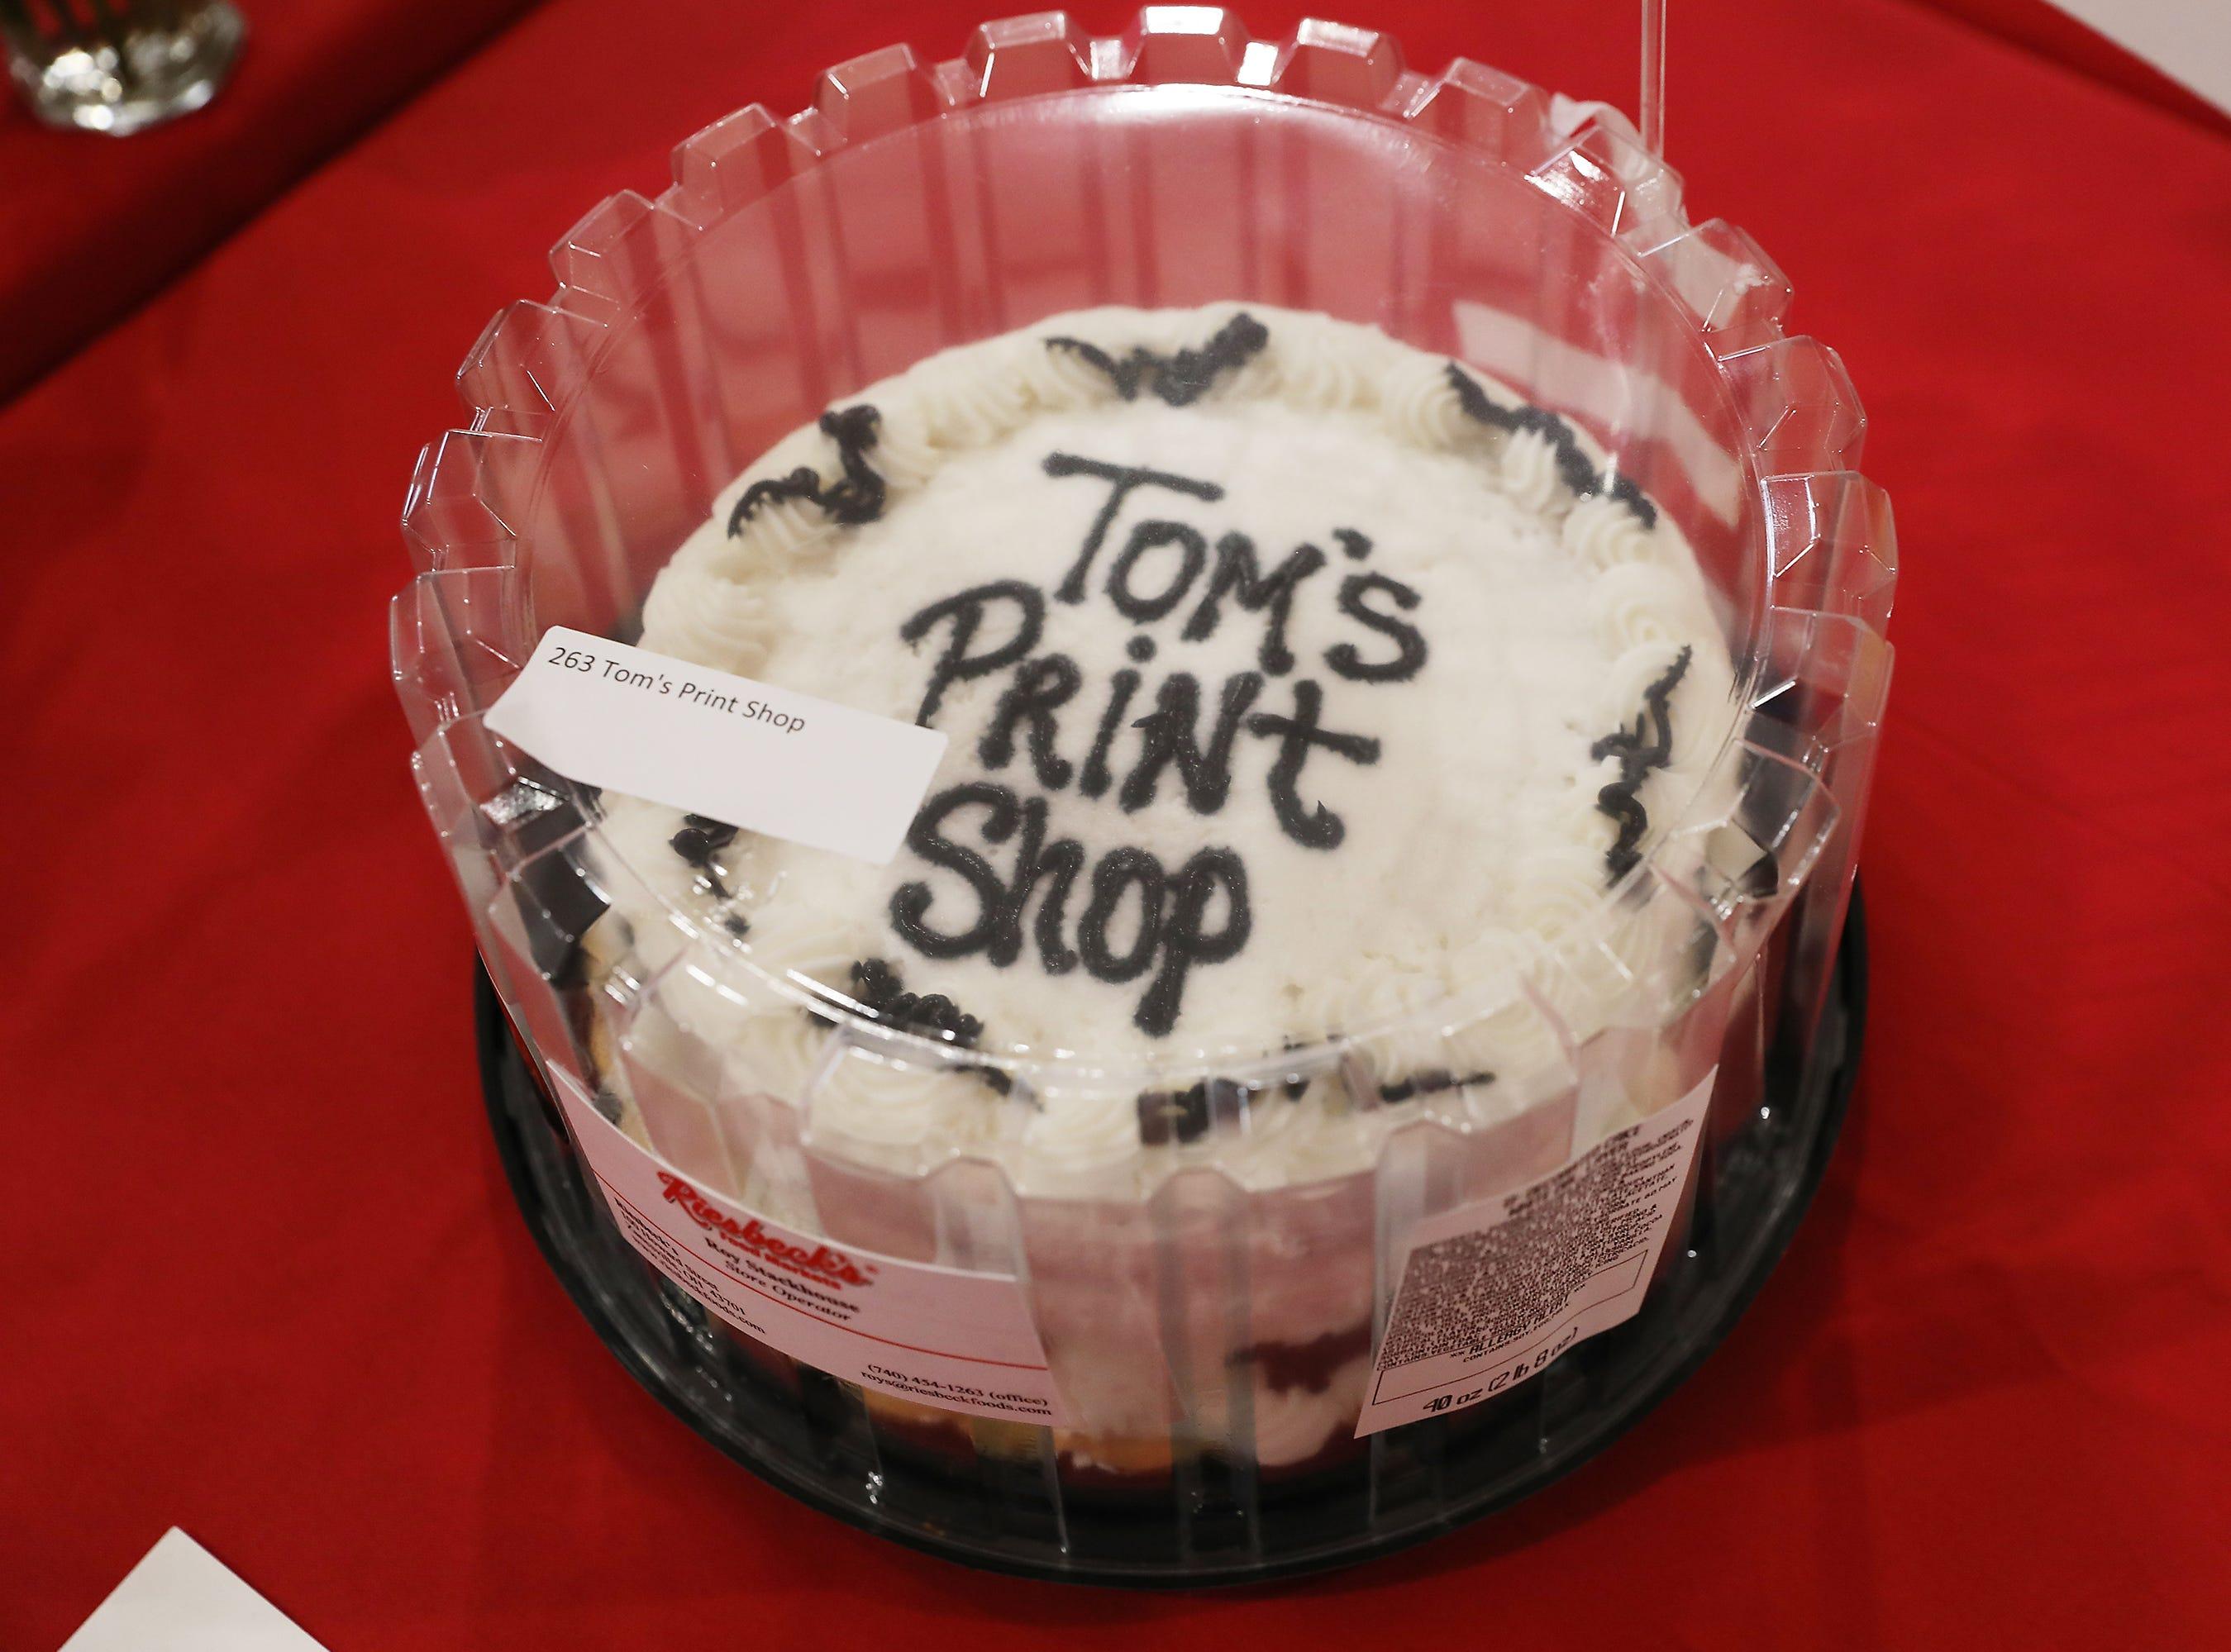 10:30 A.M. Friday cake 263 Tom's Print Shop - $25 Tom's Print gift card